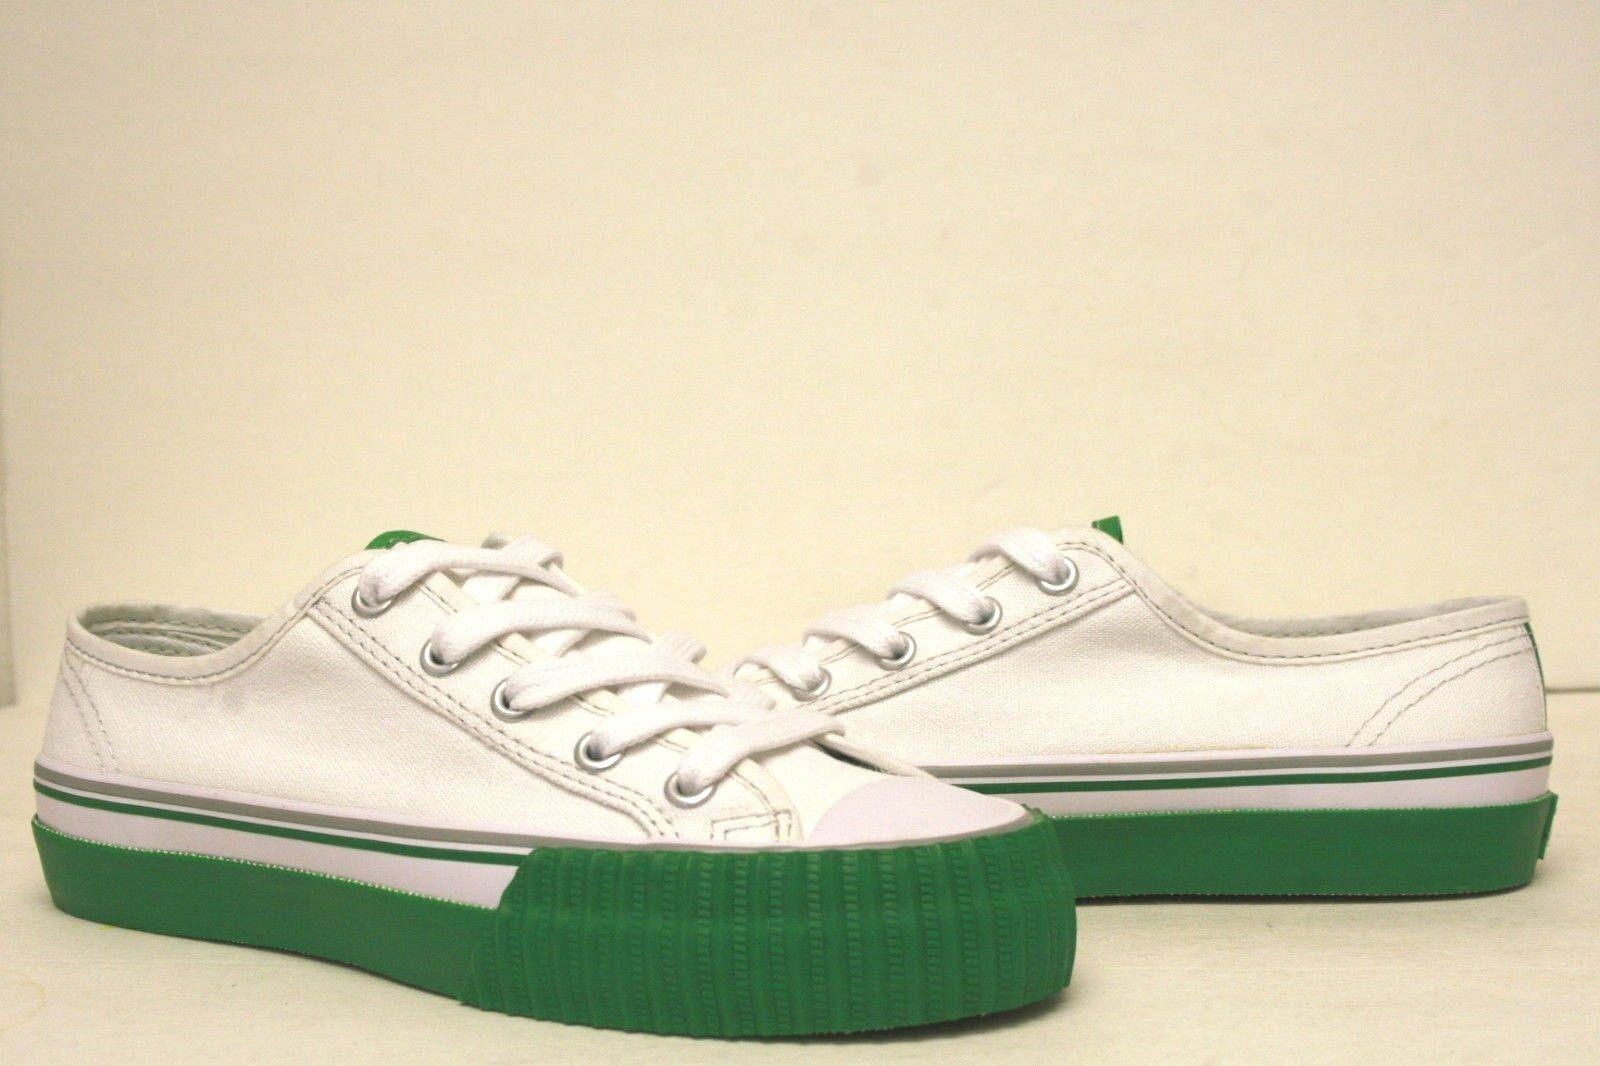 PF Flyers Center Lo Reiss White Shoes MC1002E1 Mens4.5~8.5 Womens6~10 DEADSTOCK